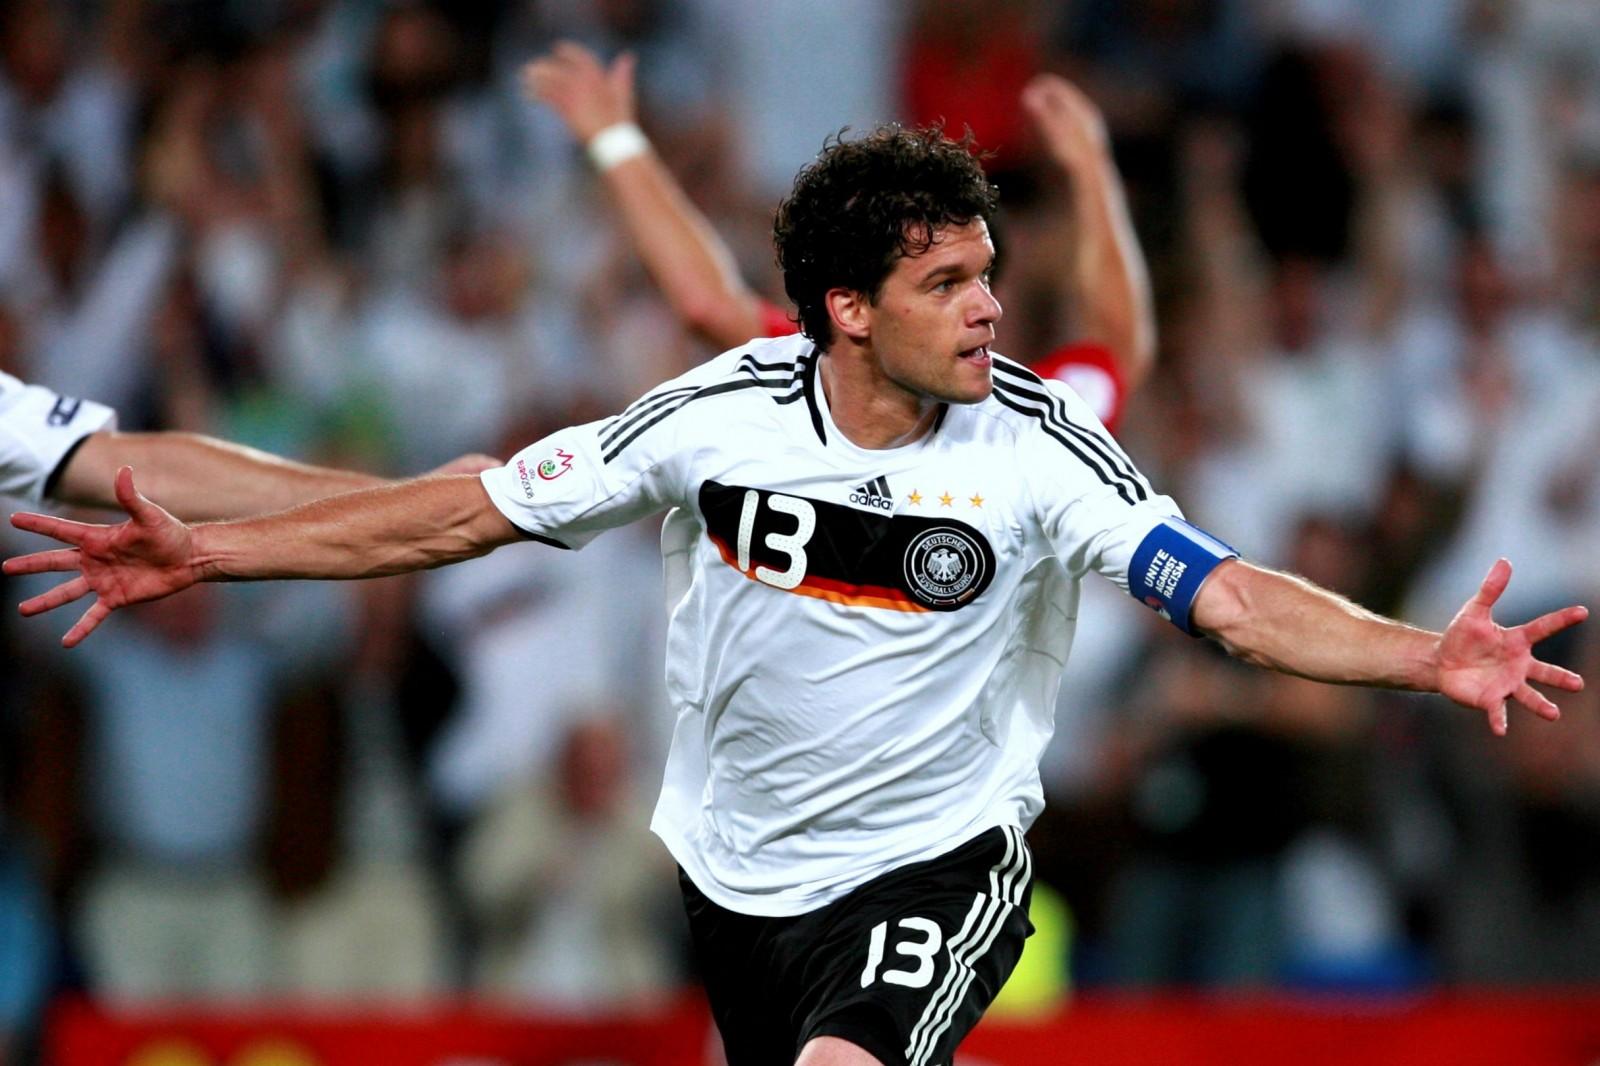 Bayer Leverkusen Wechsel Zu Chelsea Was Michael Ballack Kai Havertz Rat